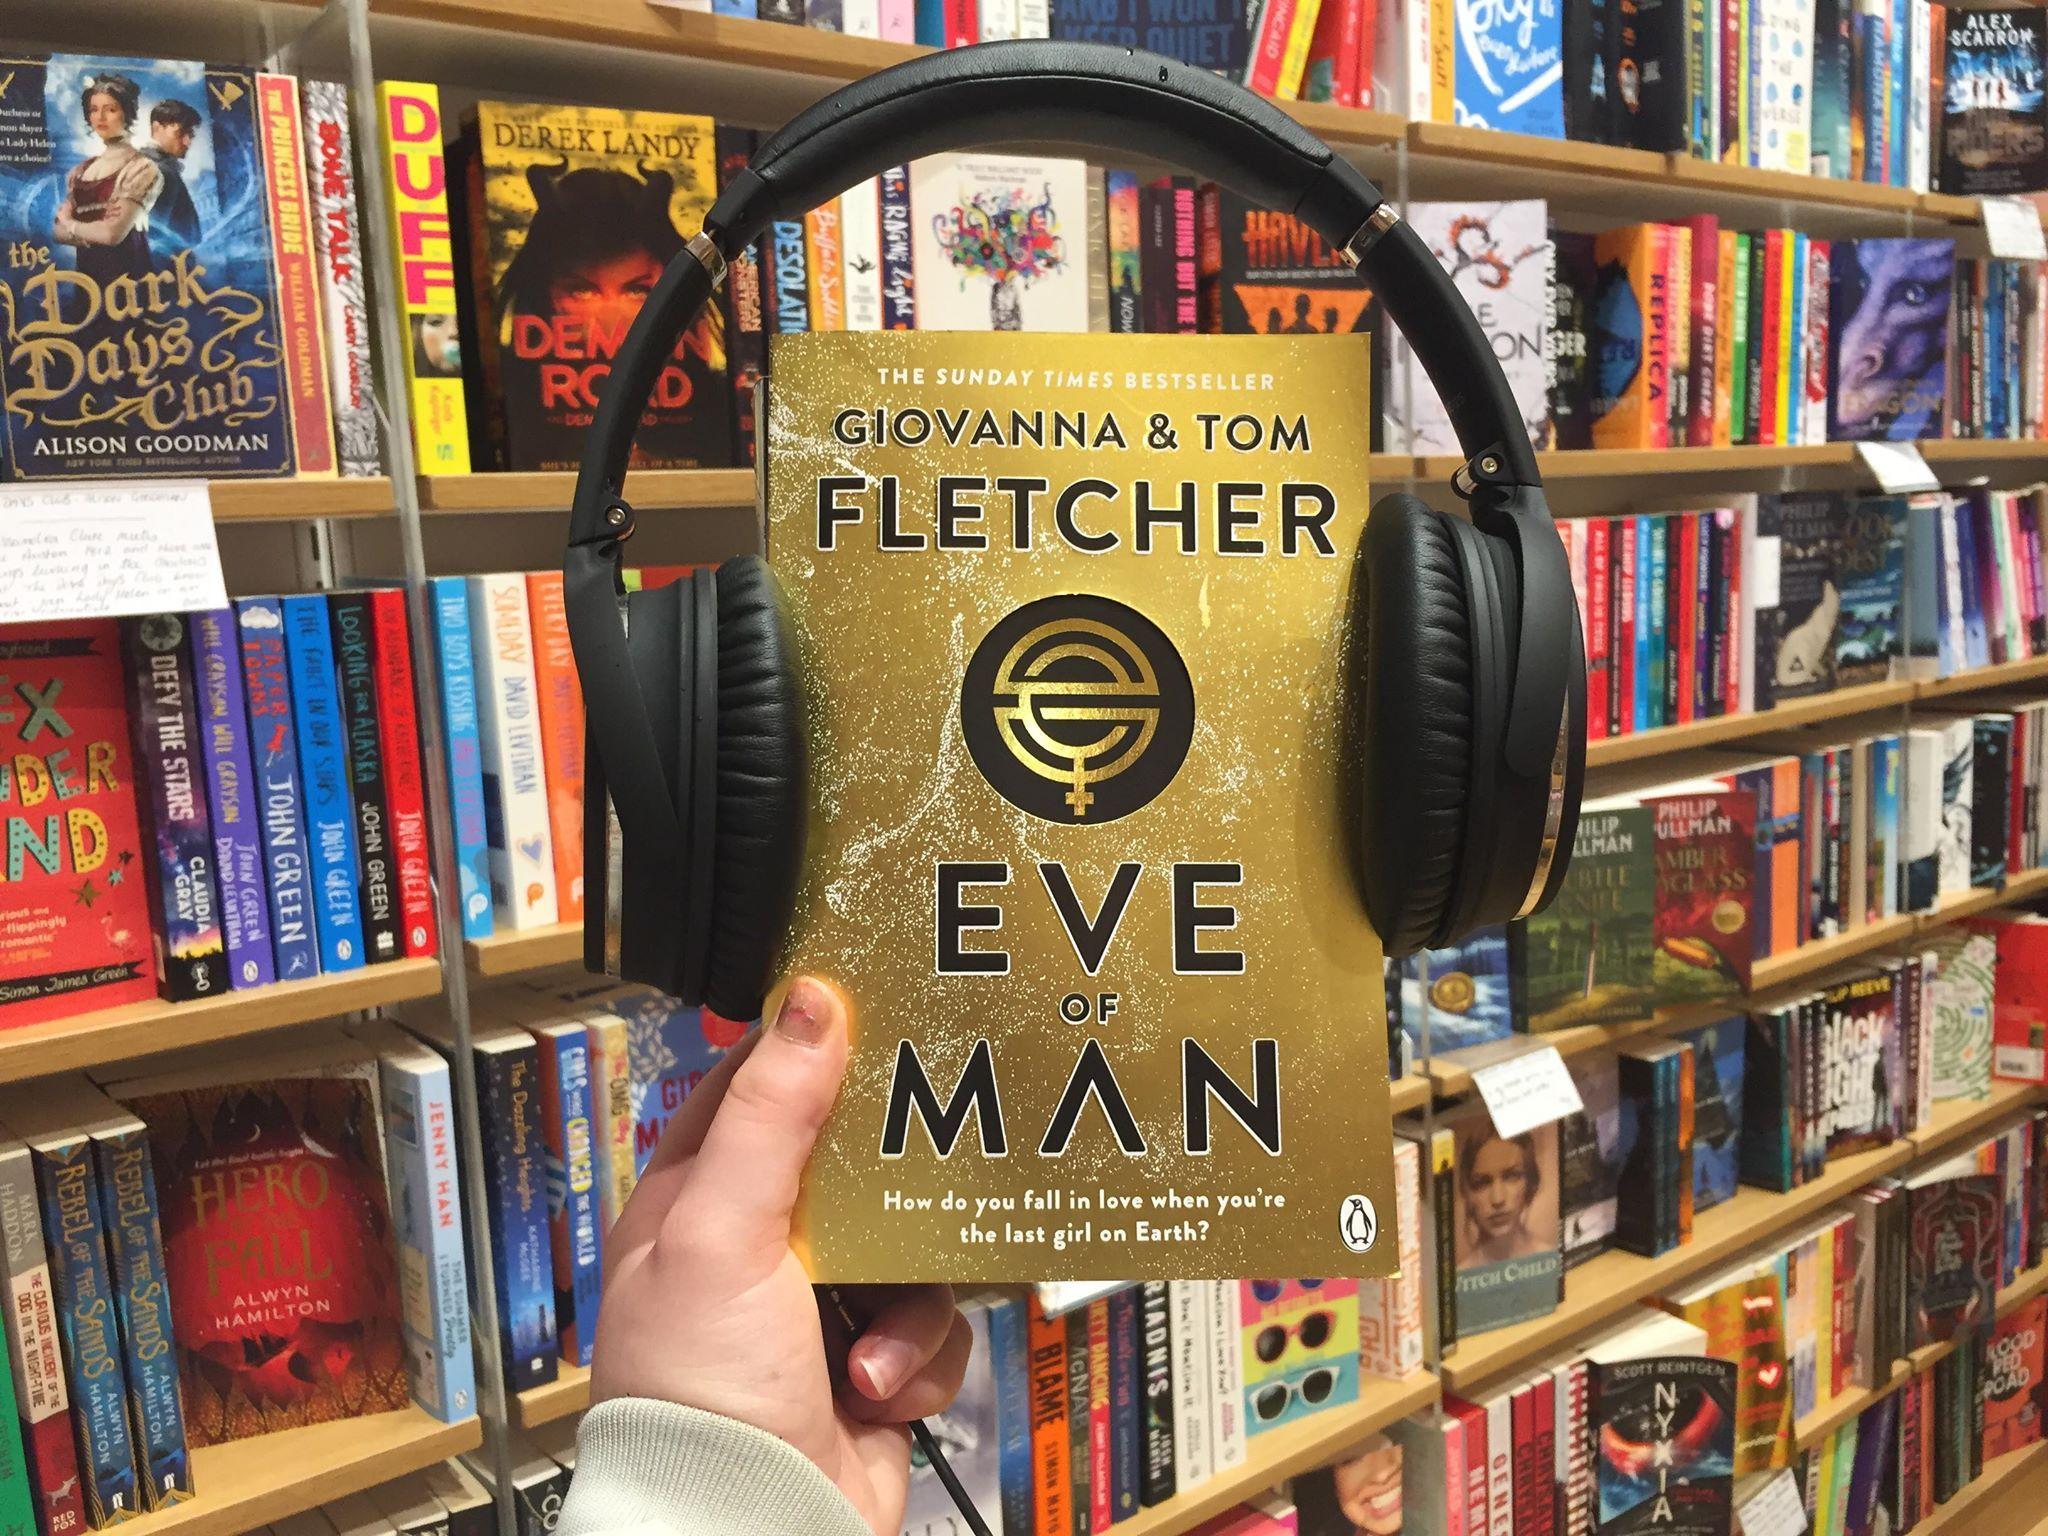 2*. 14/08/19 Tom fletcher, Audio books, Man